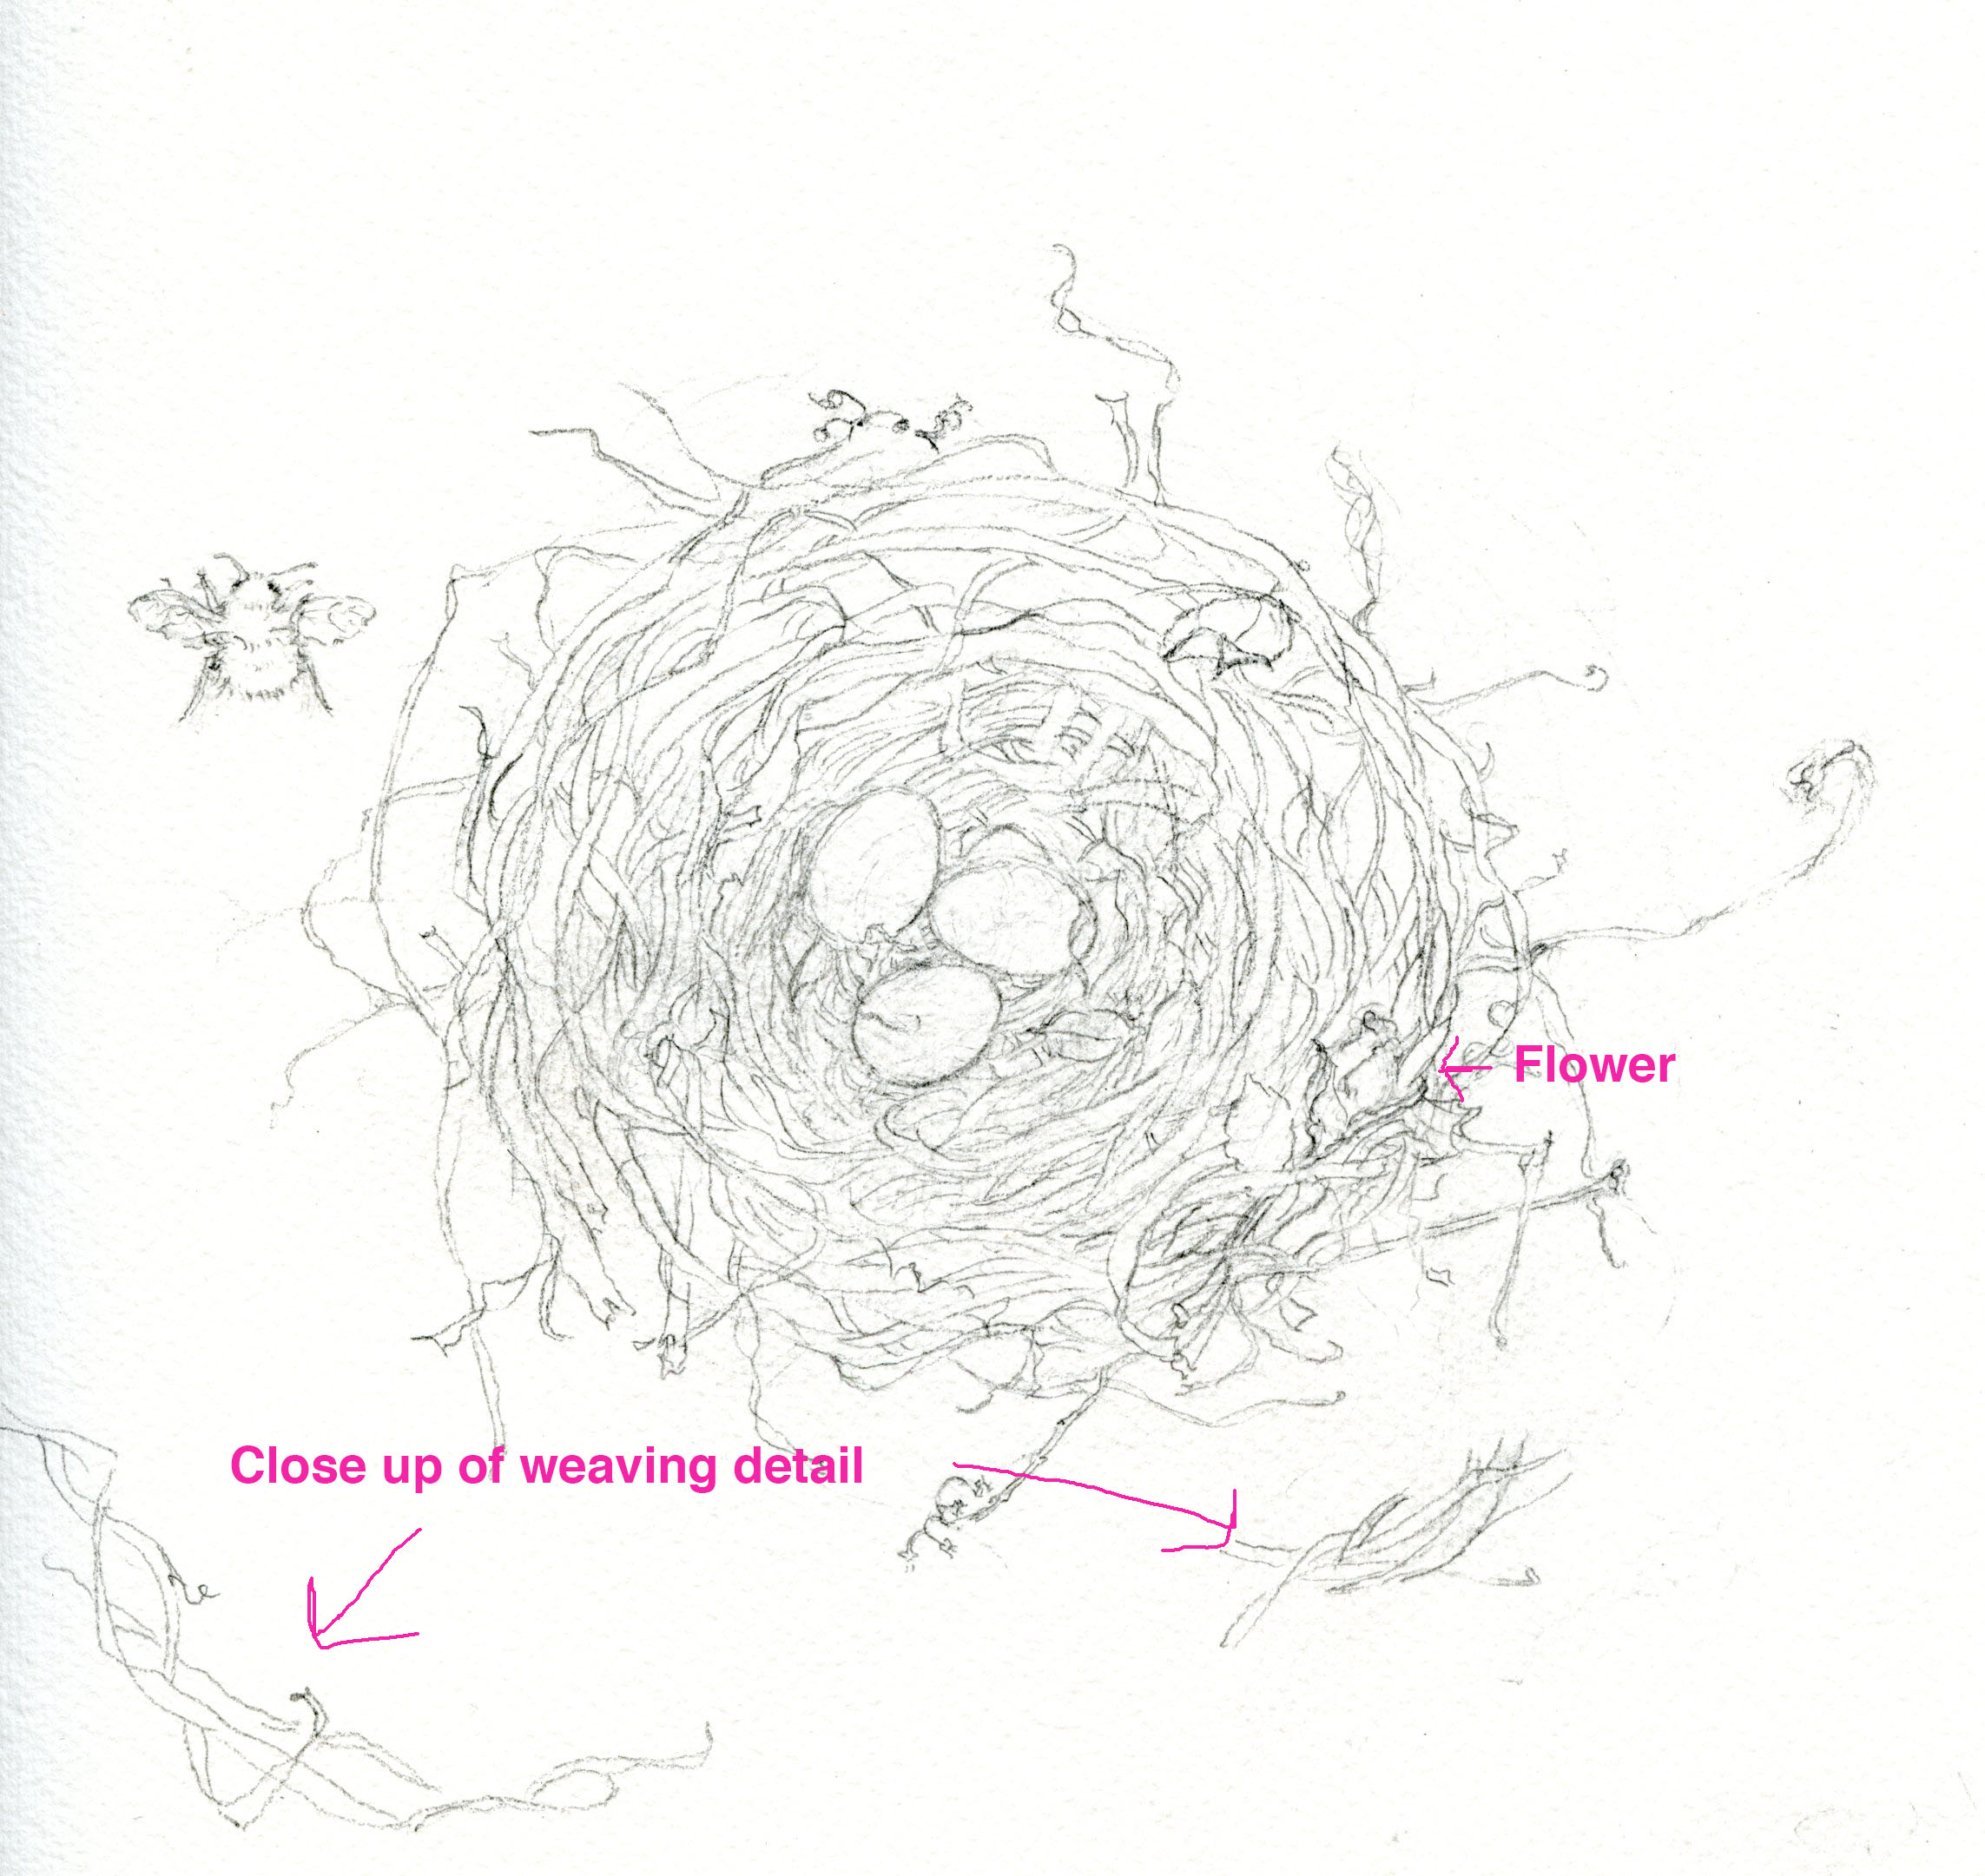 details in sketch